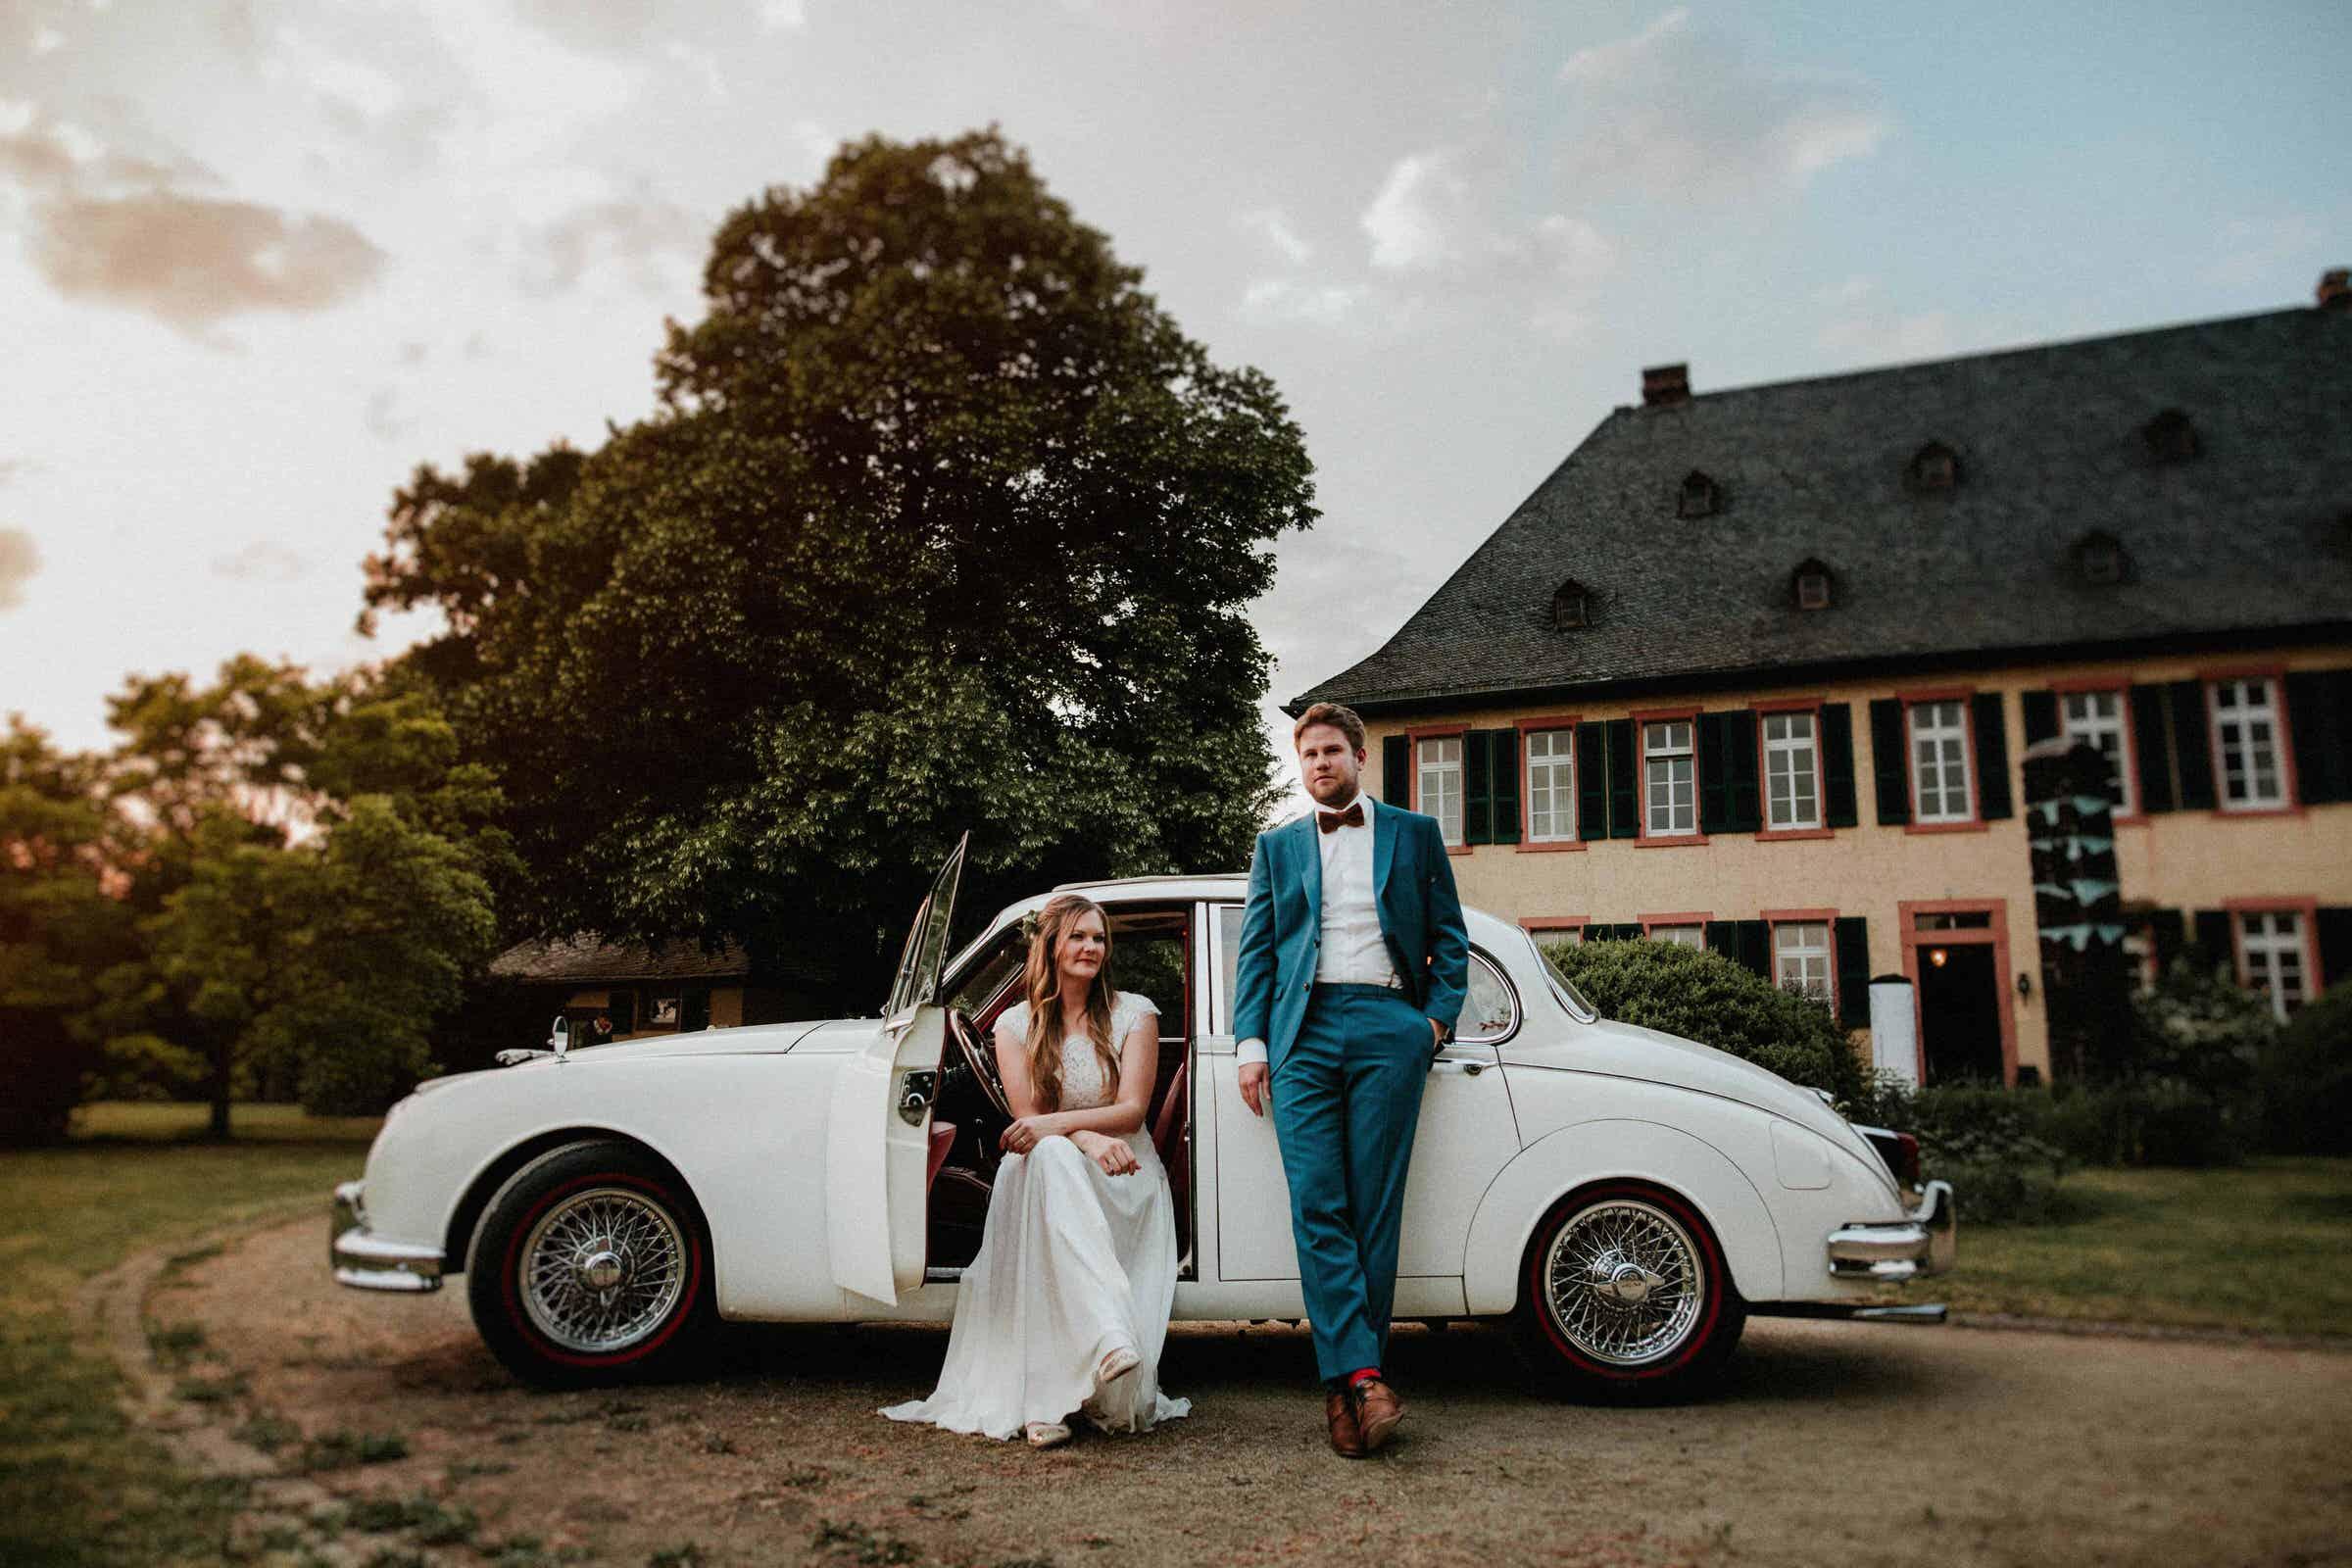 Locationscouting-Hochzeit-Rheingau-DJ